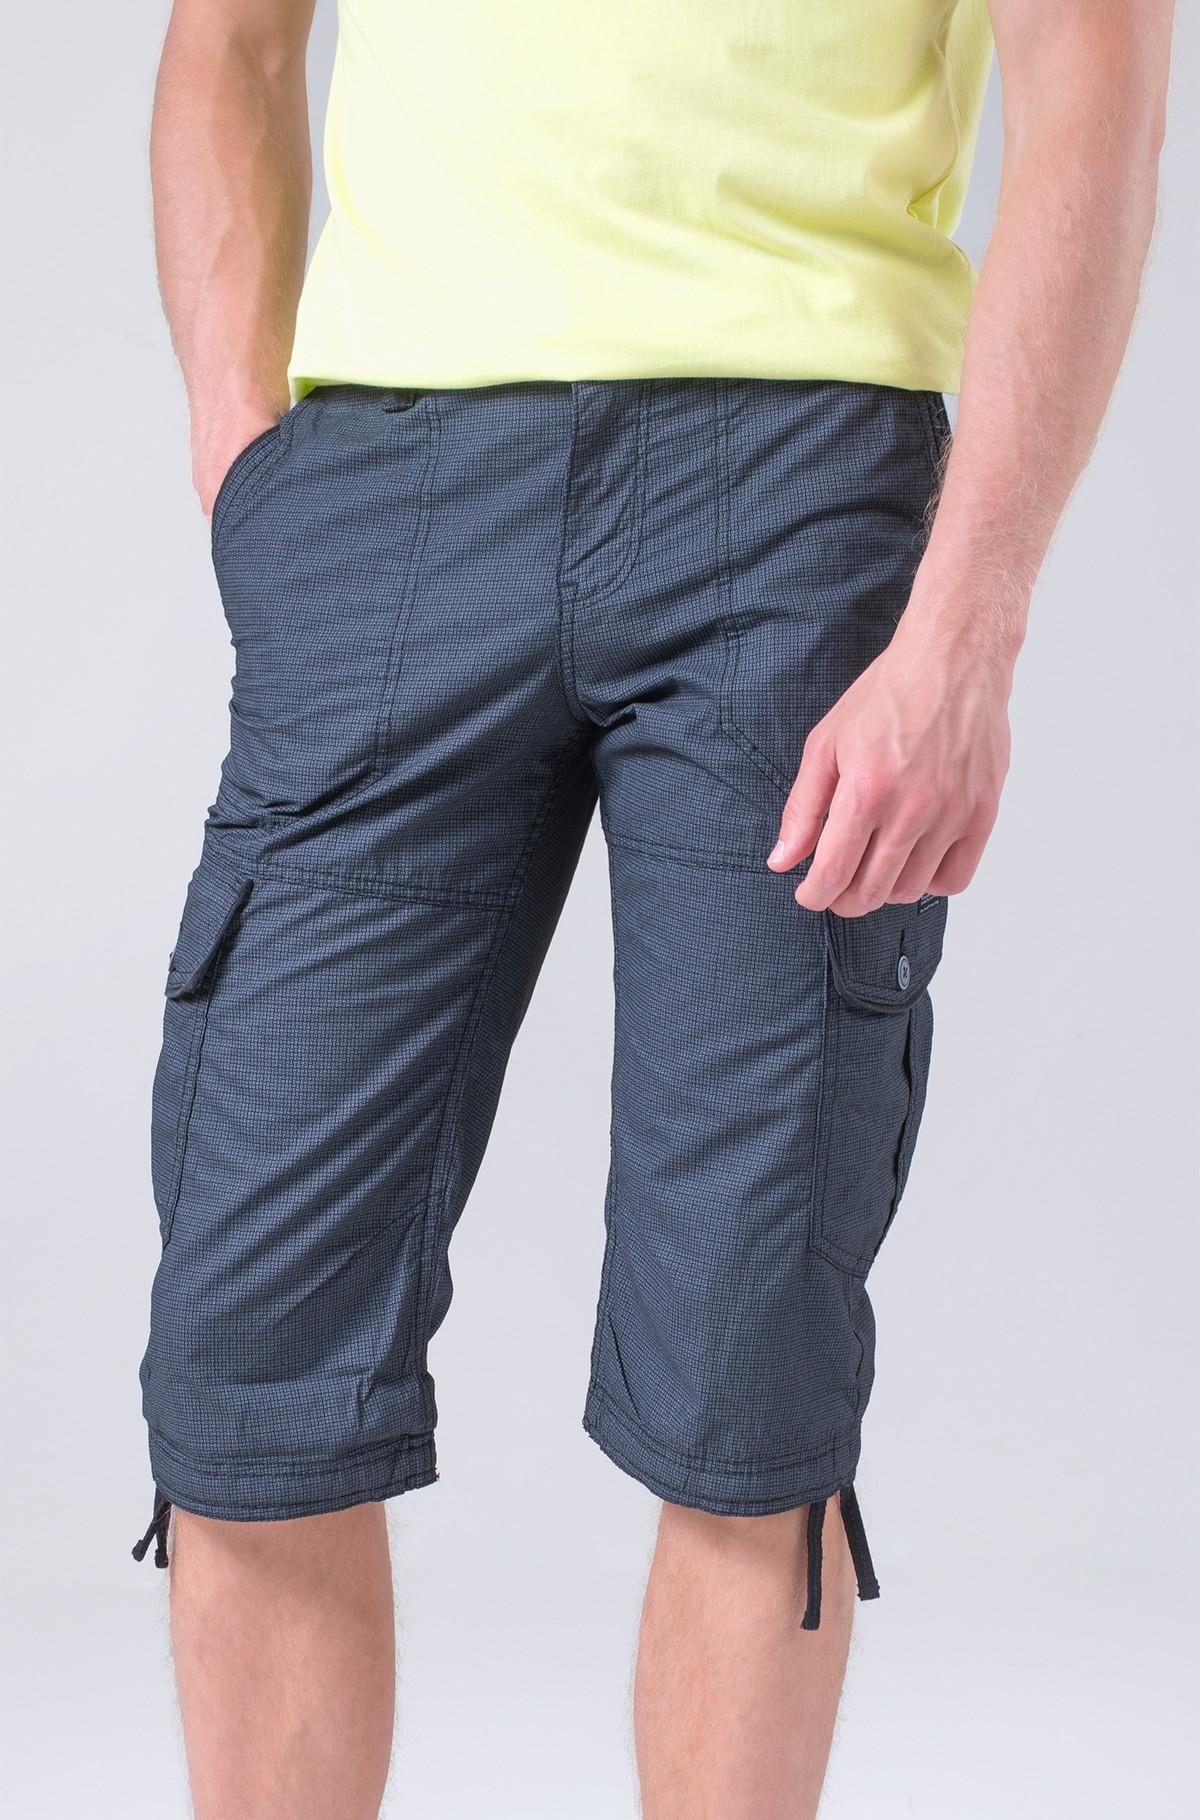 Shorts 1026235-full-1